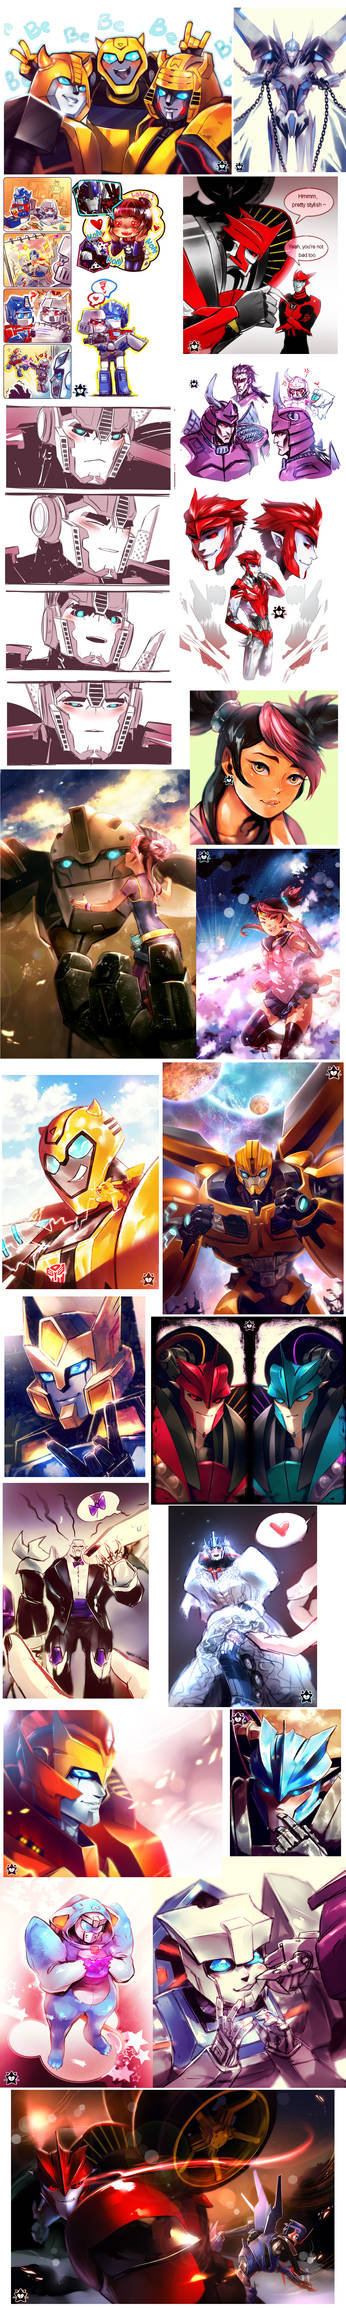 Mega Transformers Artdump